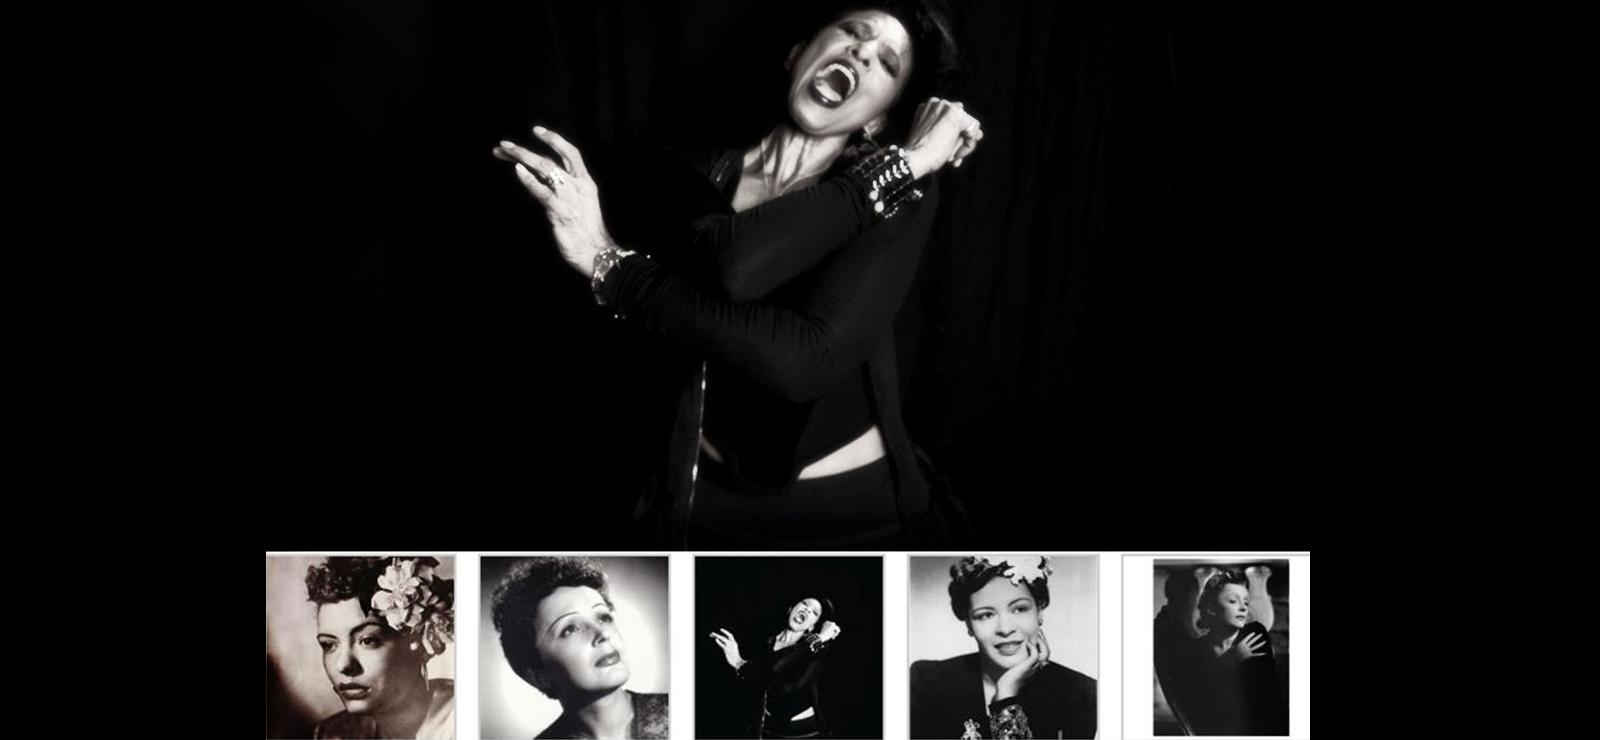 [Nona Hendryx presentsParallel Lives: Billie Holiday & Edith Piaf ] Photo by Marc Baptiste